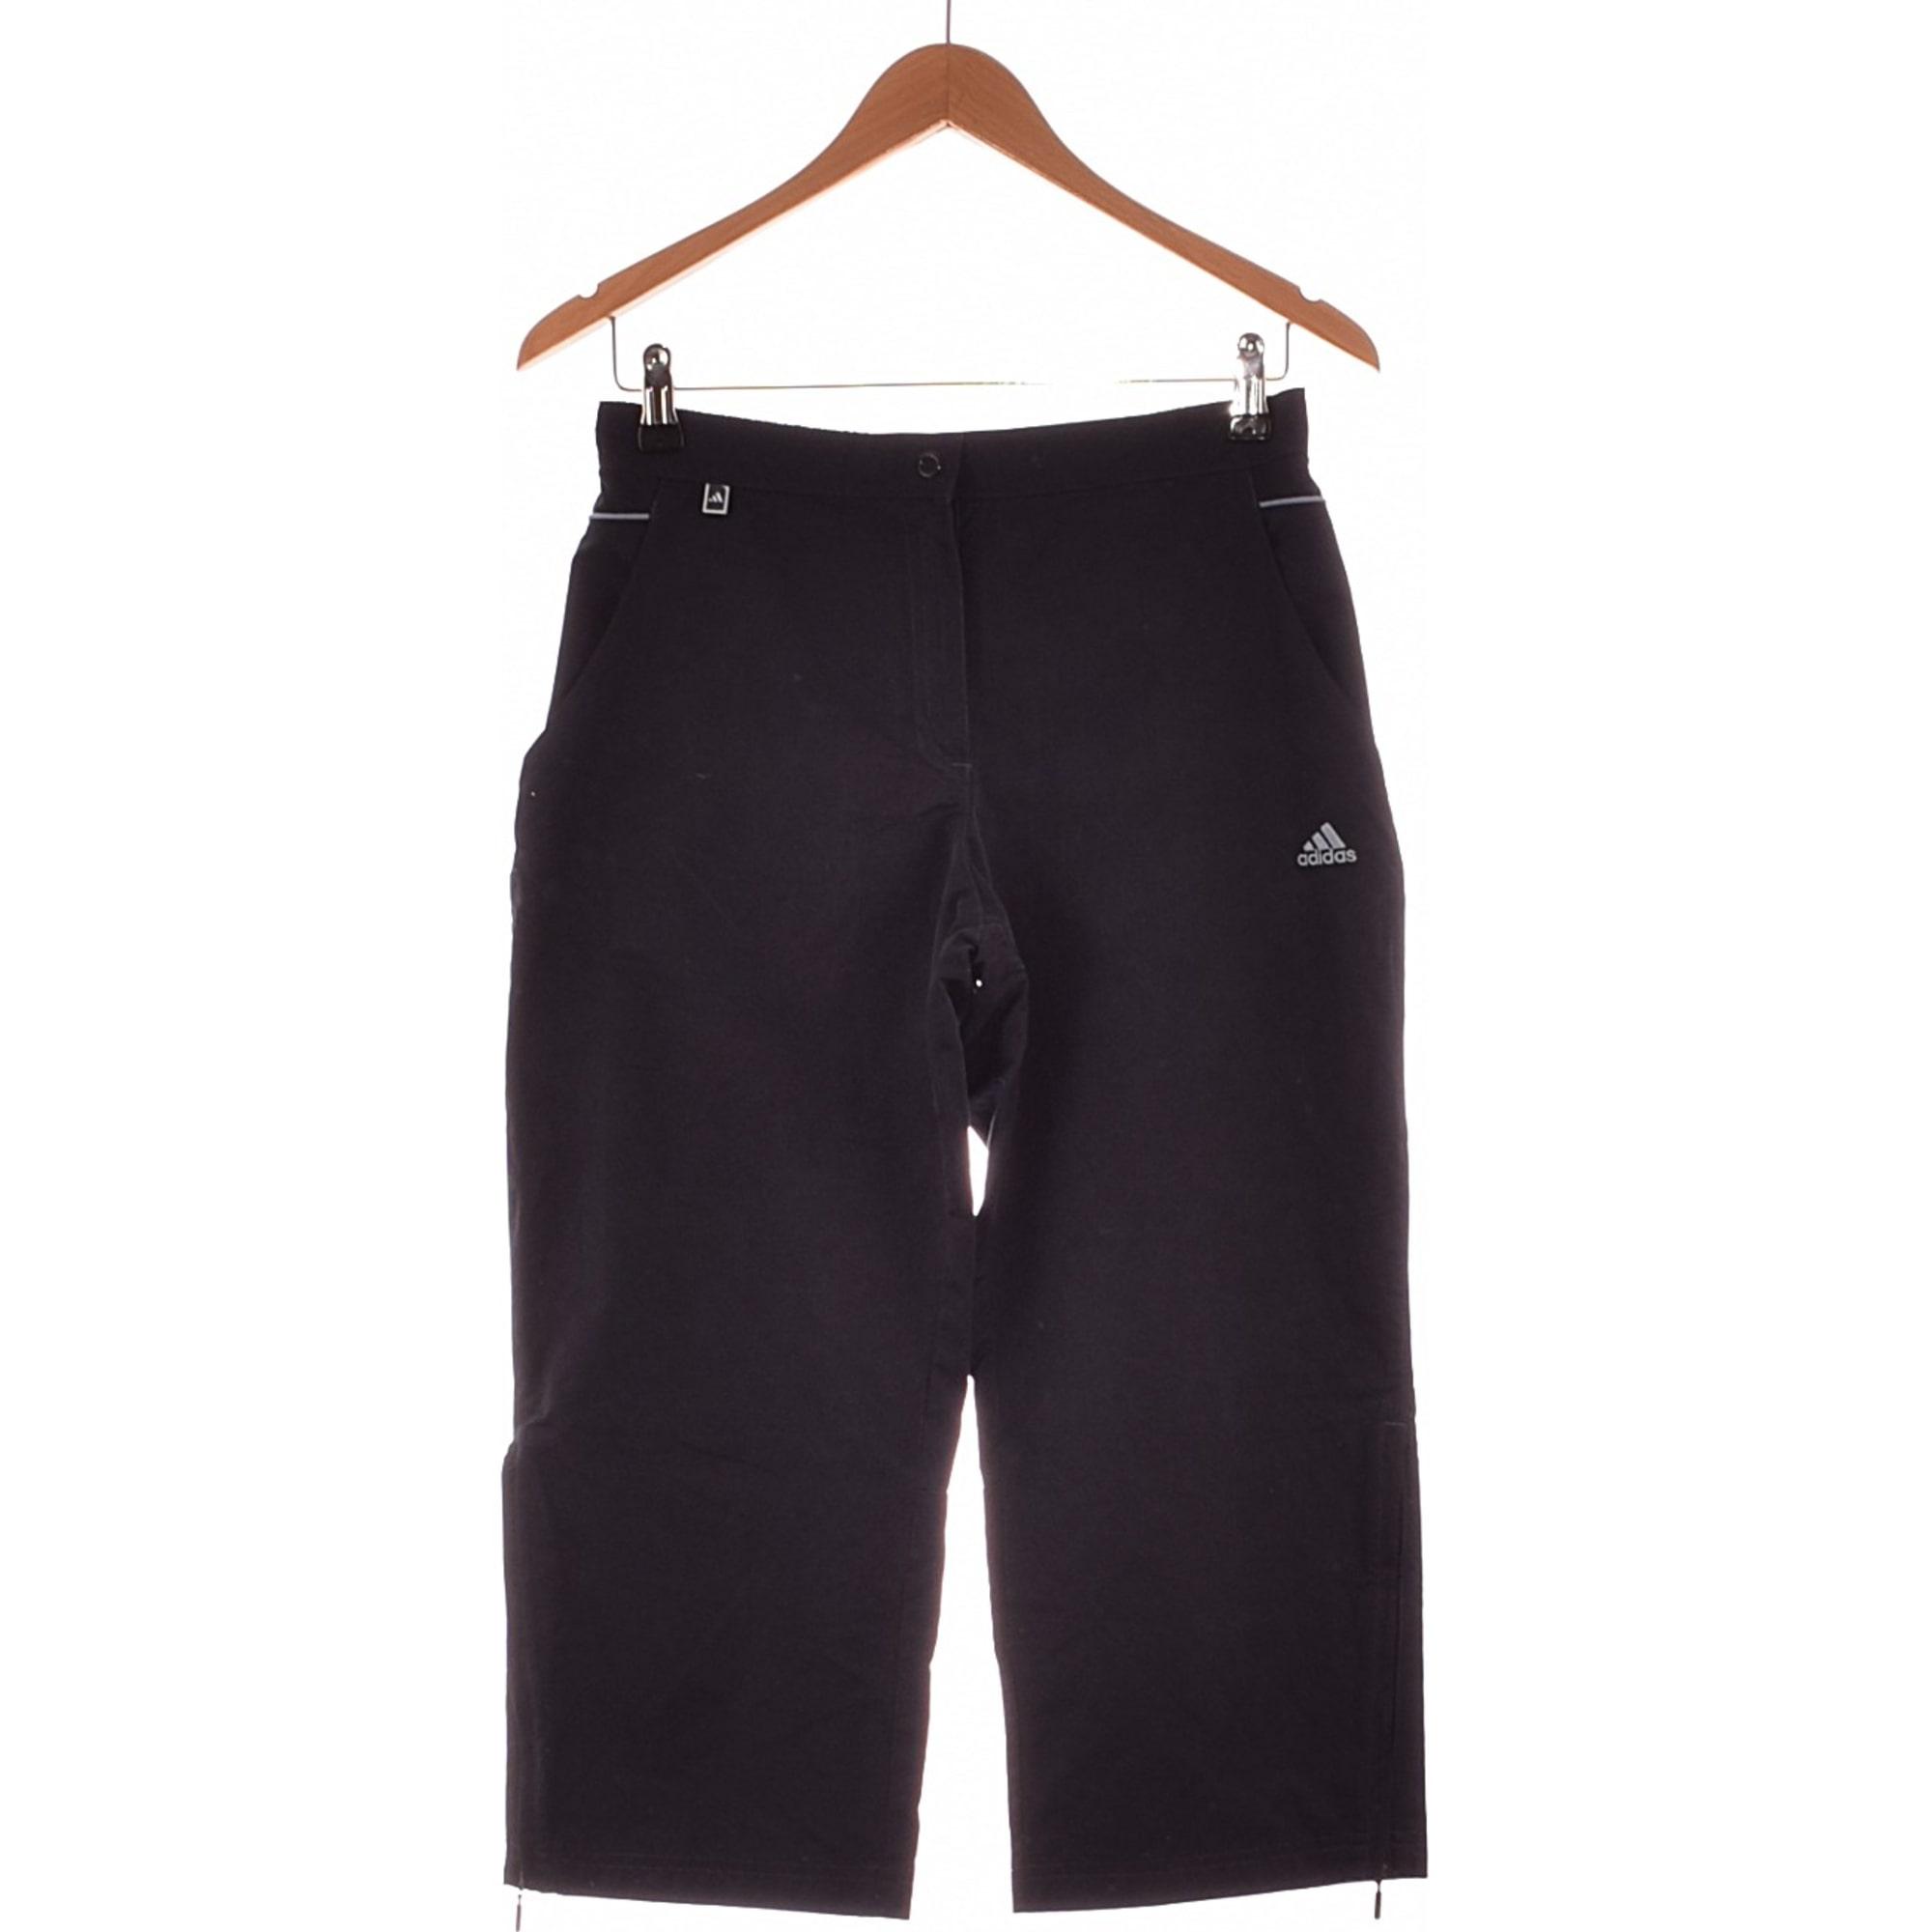 Cropped Pants, Capri Pants ADIDAS Blue, navy, turquoise